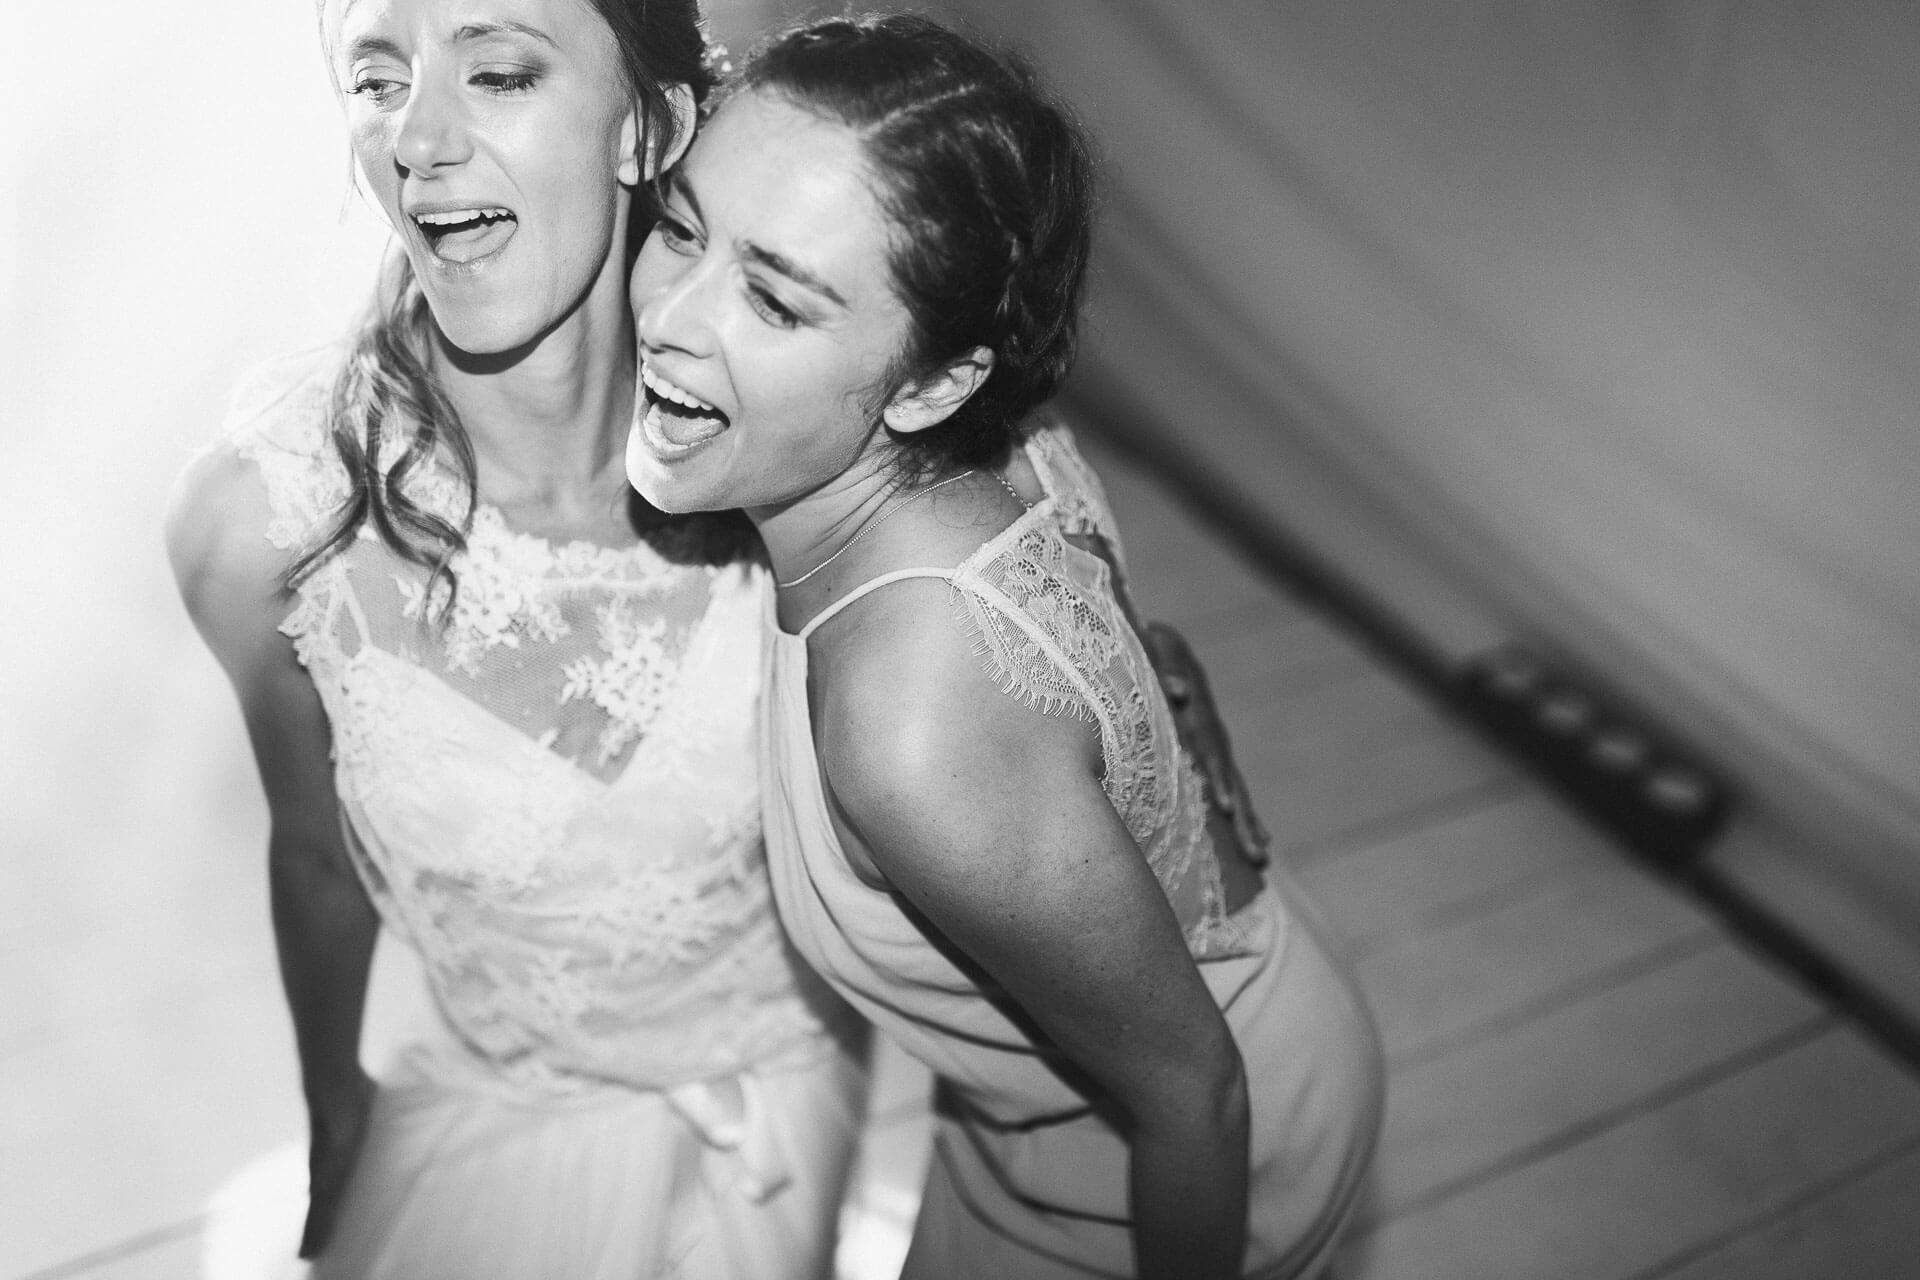 photographe-mariage-aix-en-provence-stephanie-jerome-32